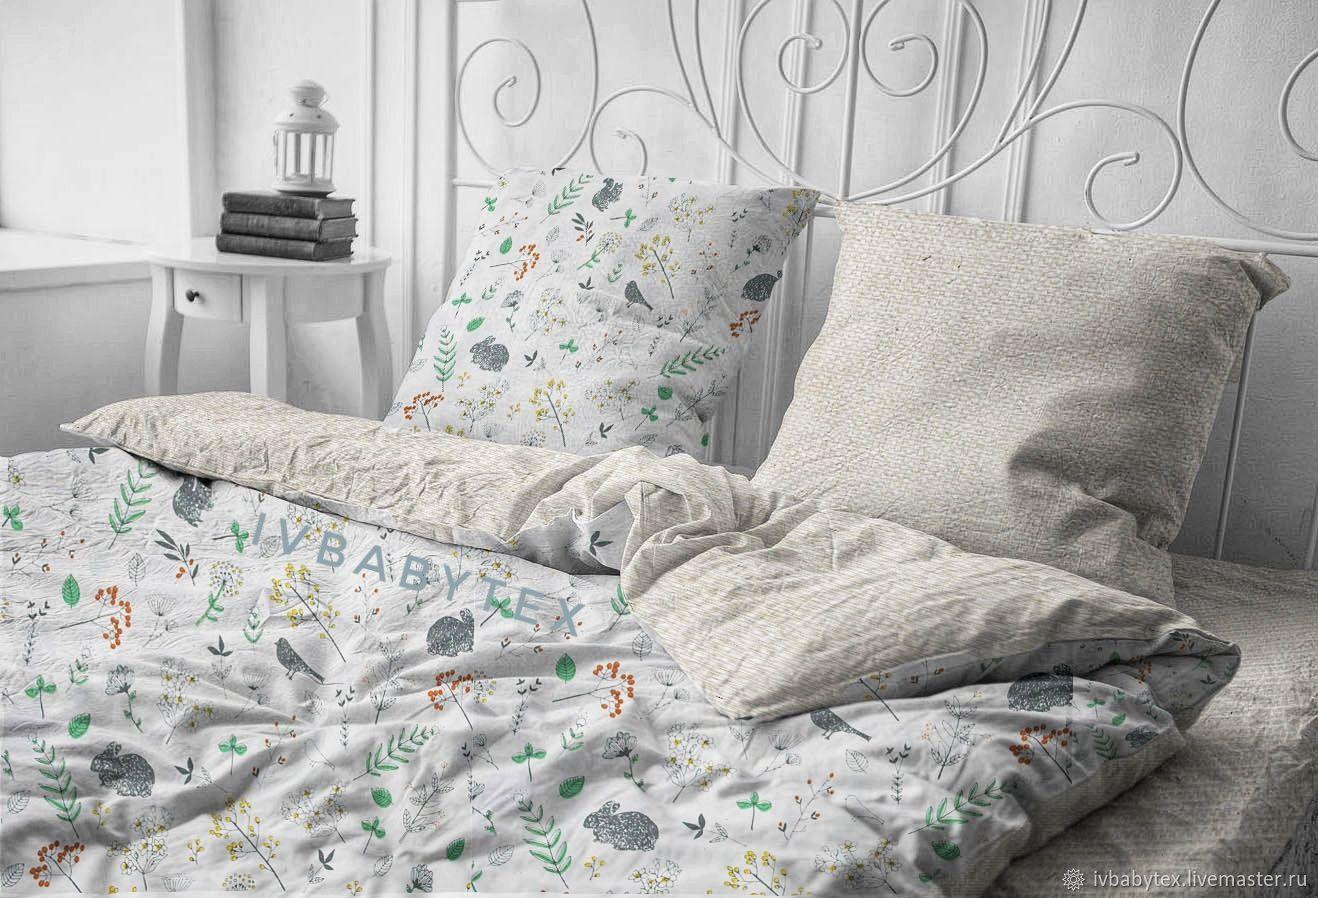 Linen linen cotton ' Twigs', Bedding sets, Ivanovo,  Фото №1